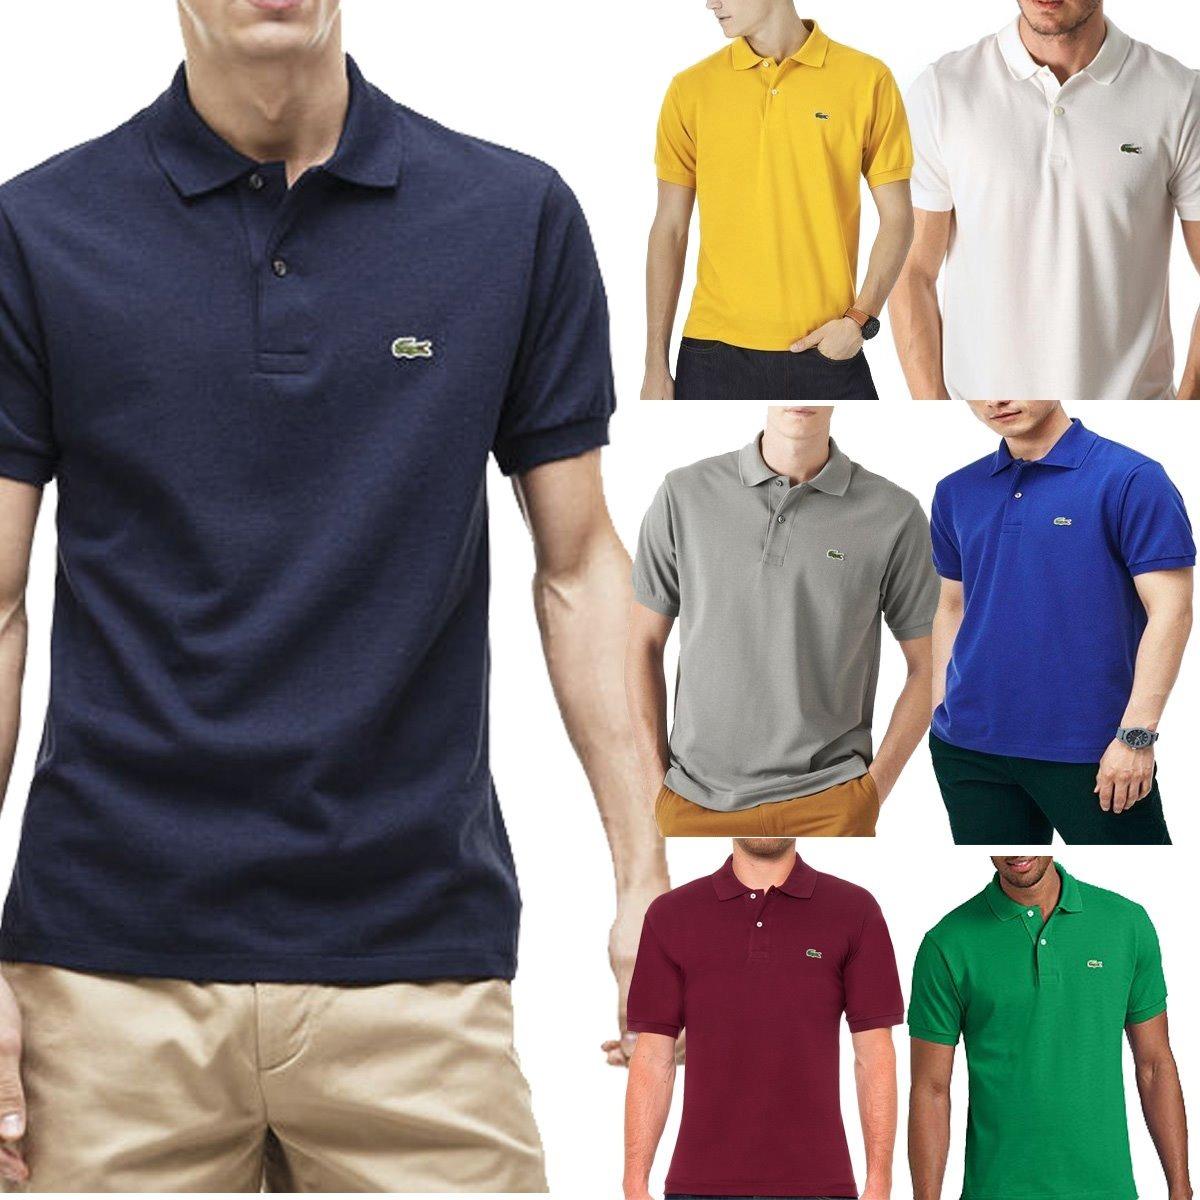 kit 3 camisas polo luxo camisetas masculinas atacado revenda. Carregando  zoom. 52c3088ef2913